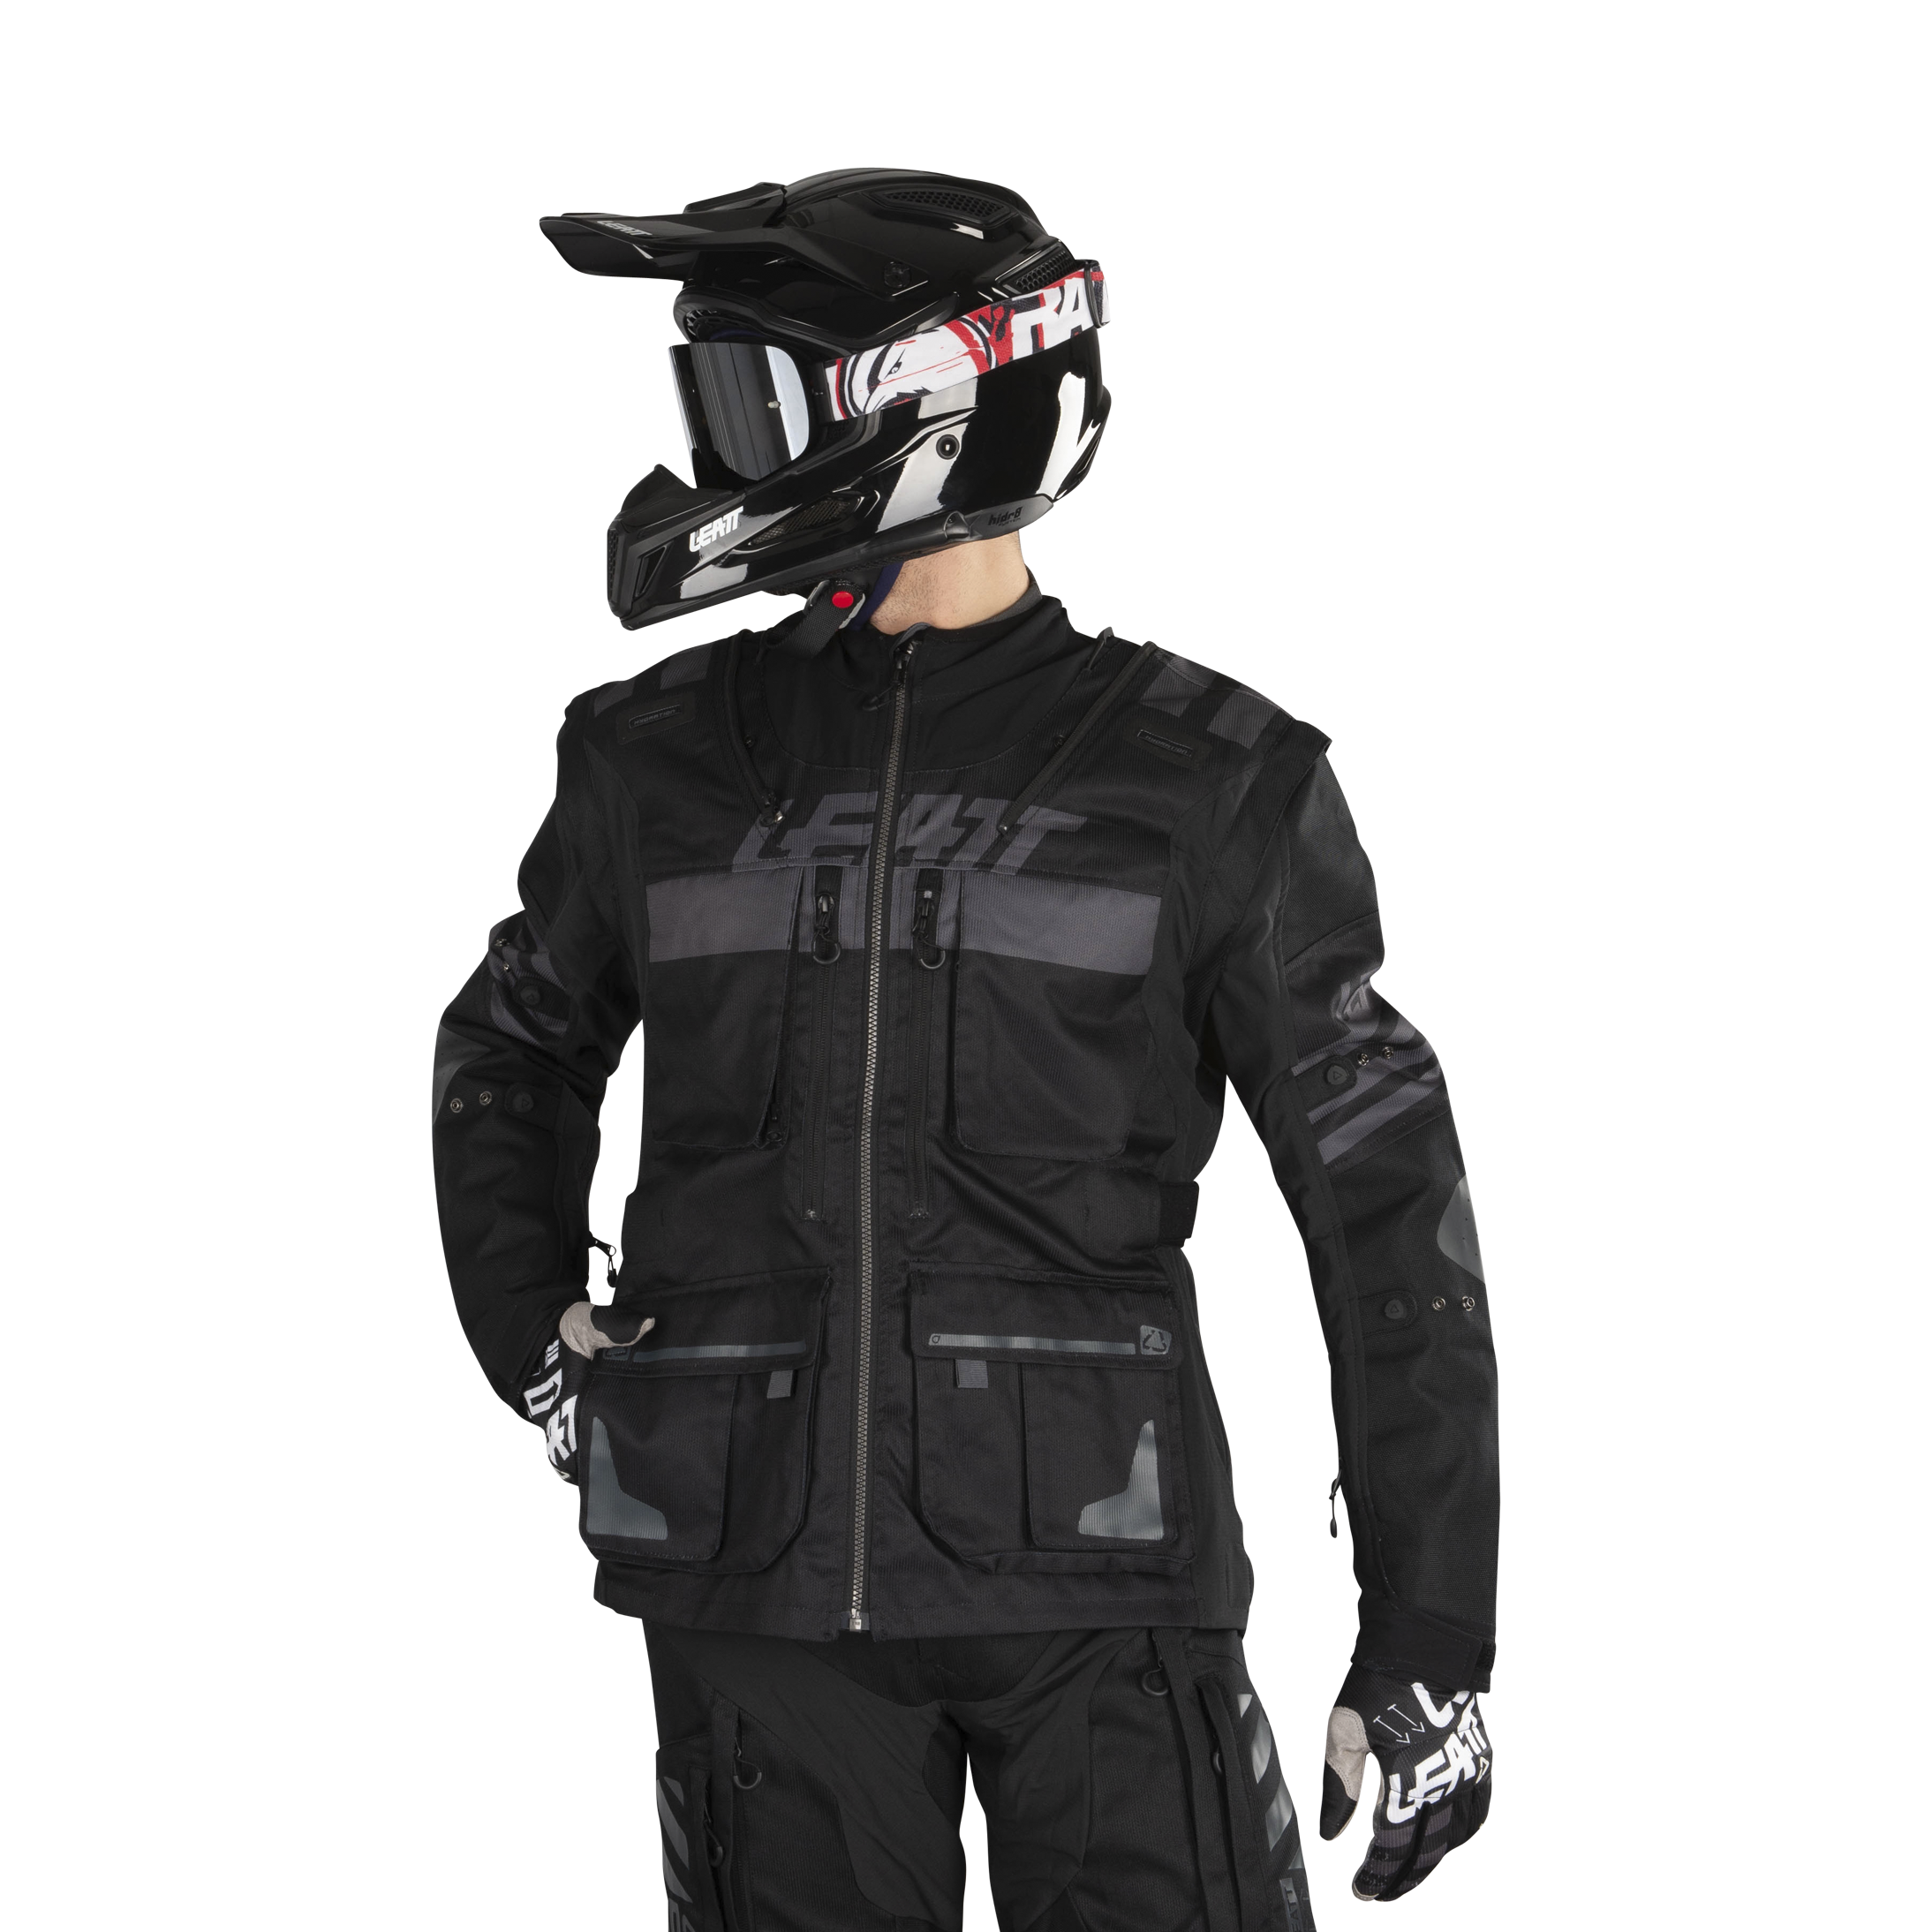 Leatt GPX 5.5 Enduro Riding Jacket-Black-3XL